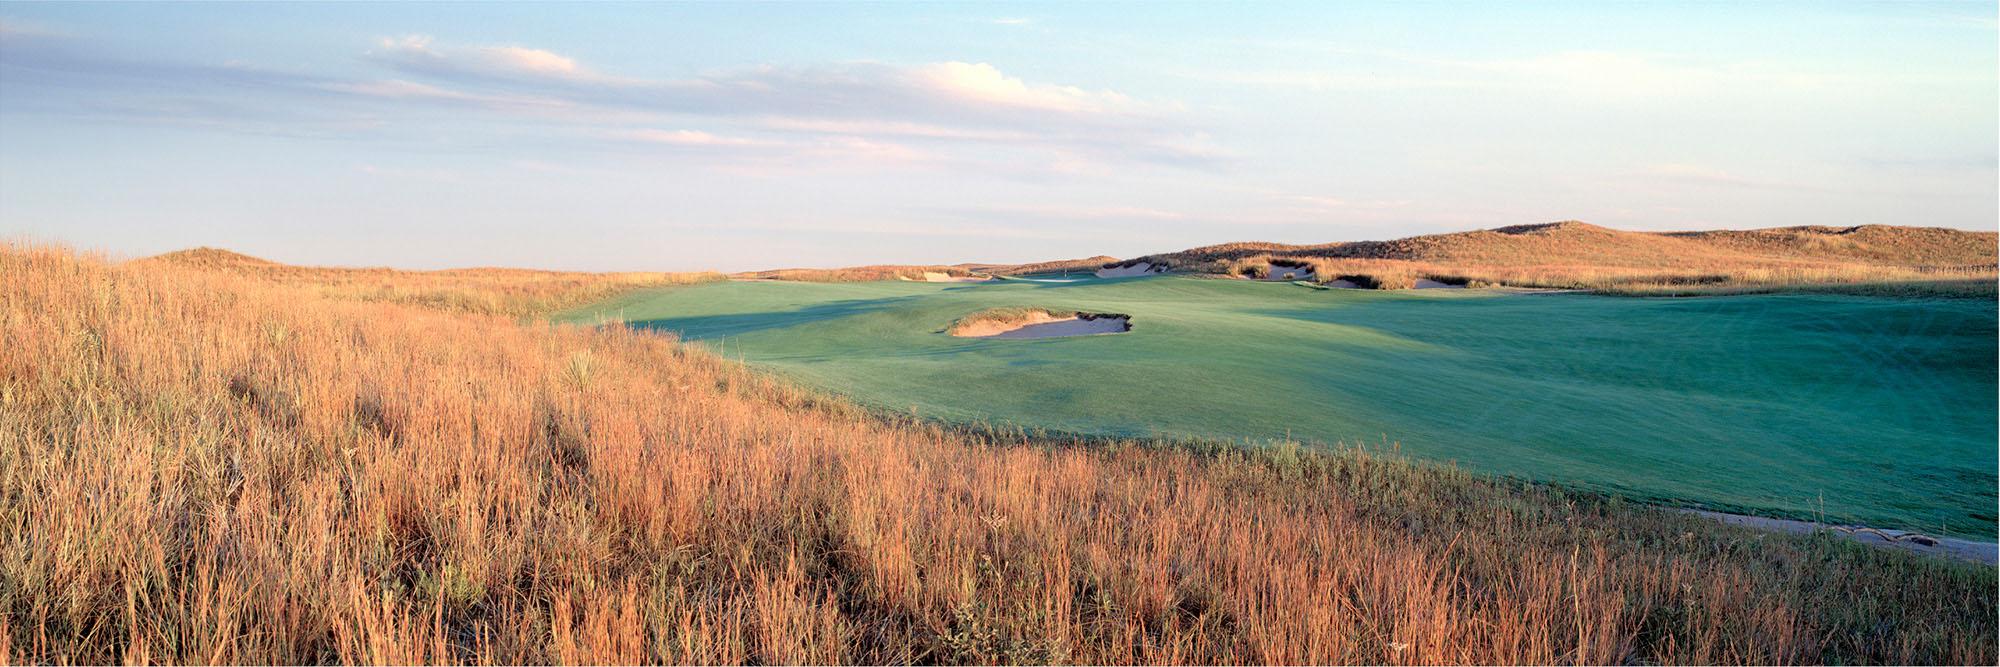 Golf Course Image - Sand Hills No. 5